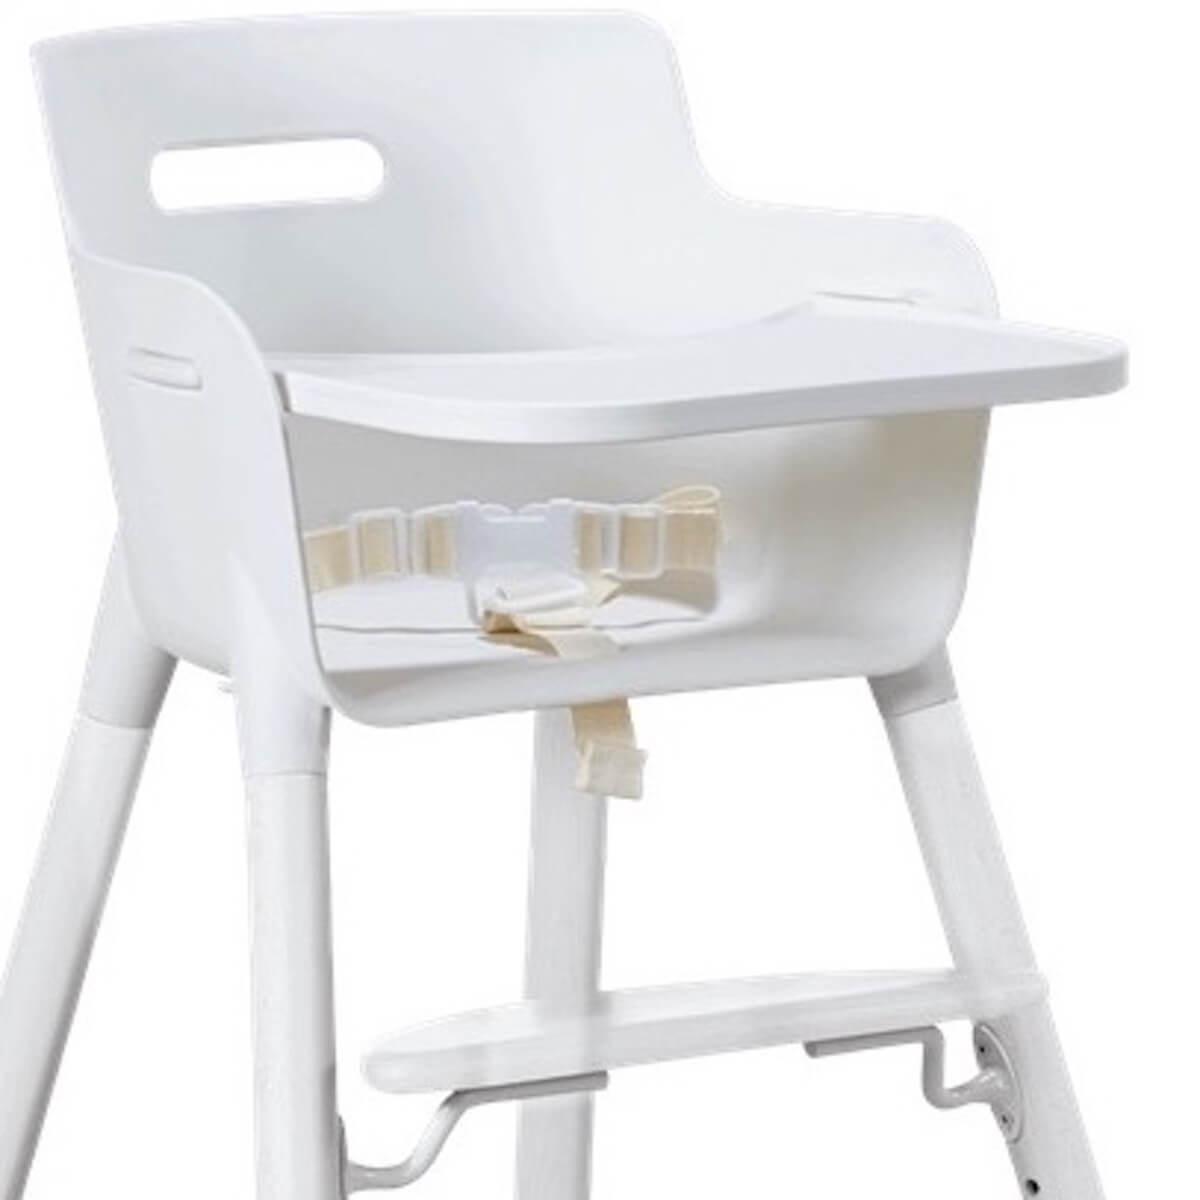 Trona bebé-bandeja BABY Flexa blanco